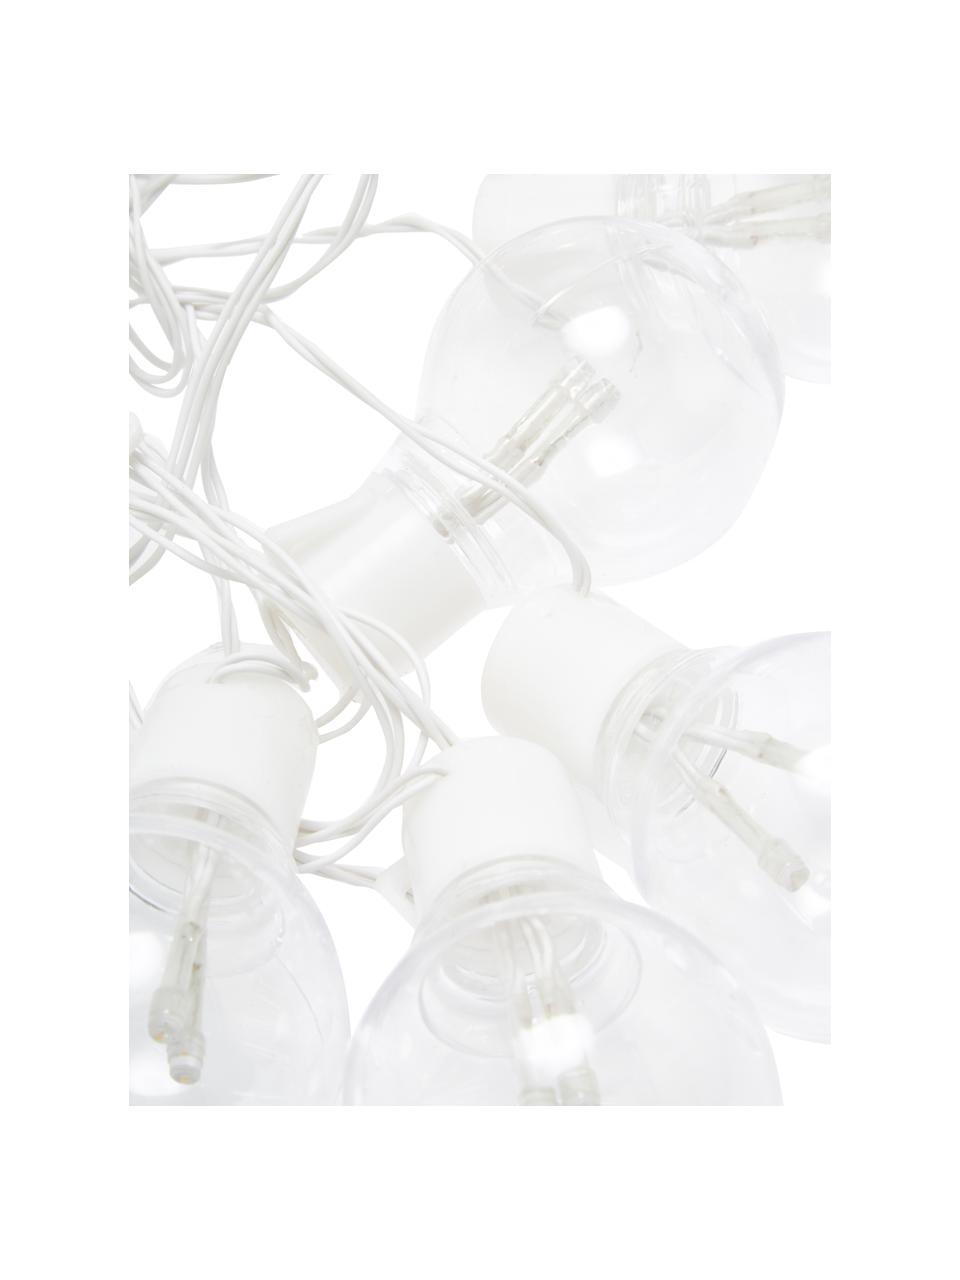 Guirlande lumineuse guinguette LED Partaj, 950cm, Blanc